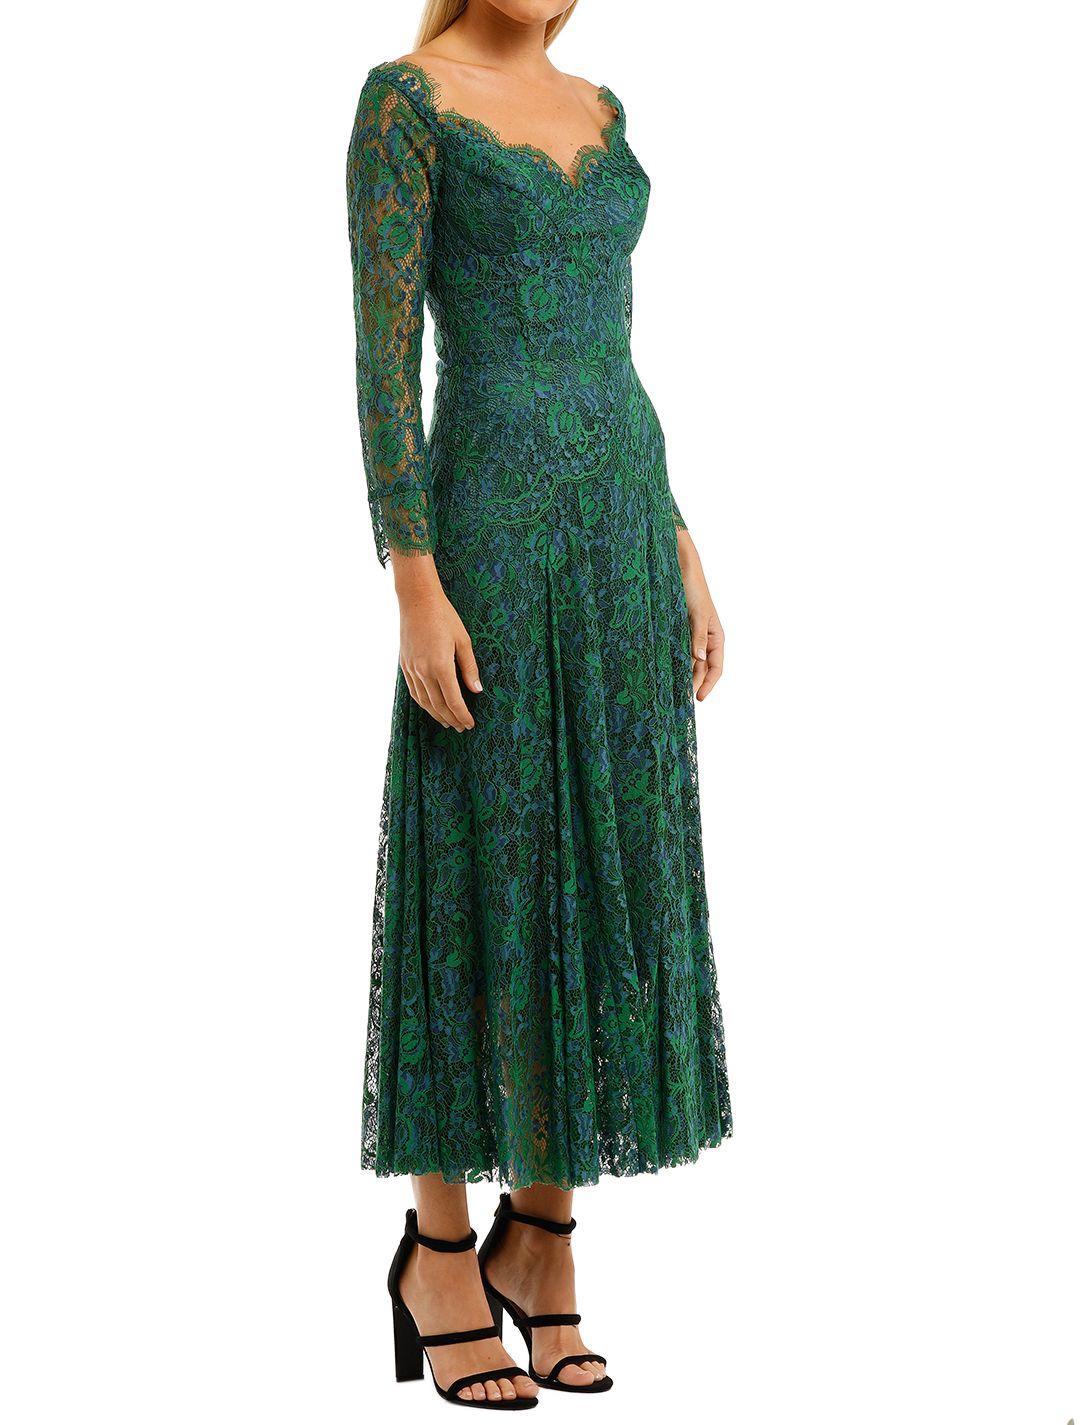 Moss-and-Spy-Kathleen-Dress-Emerad-Side